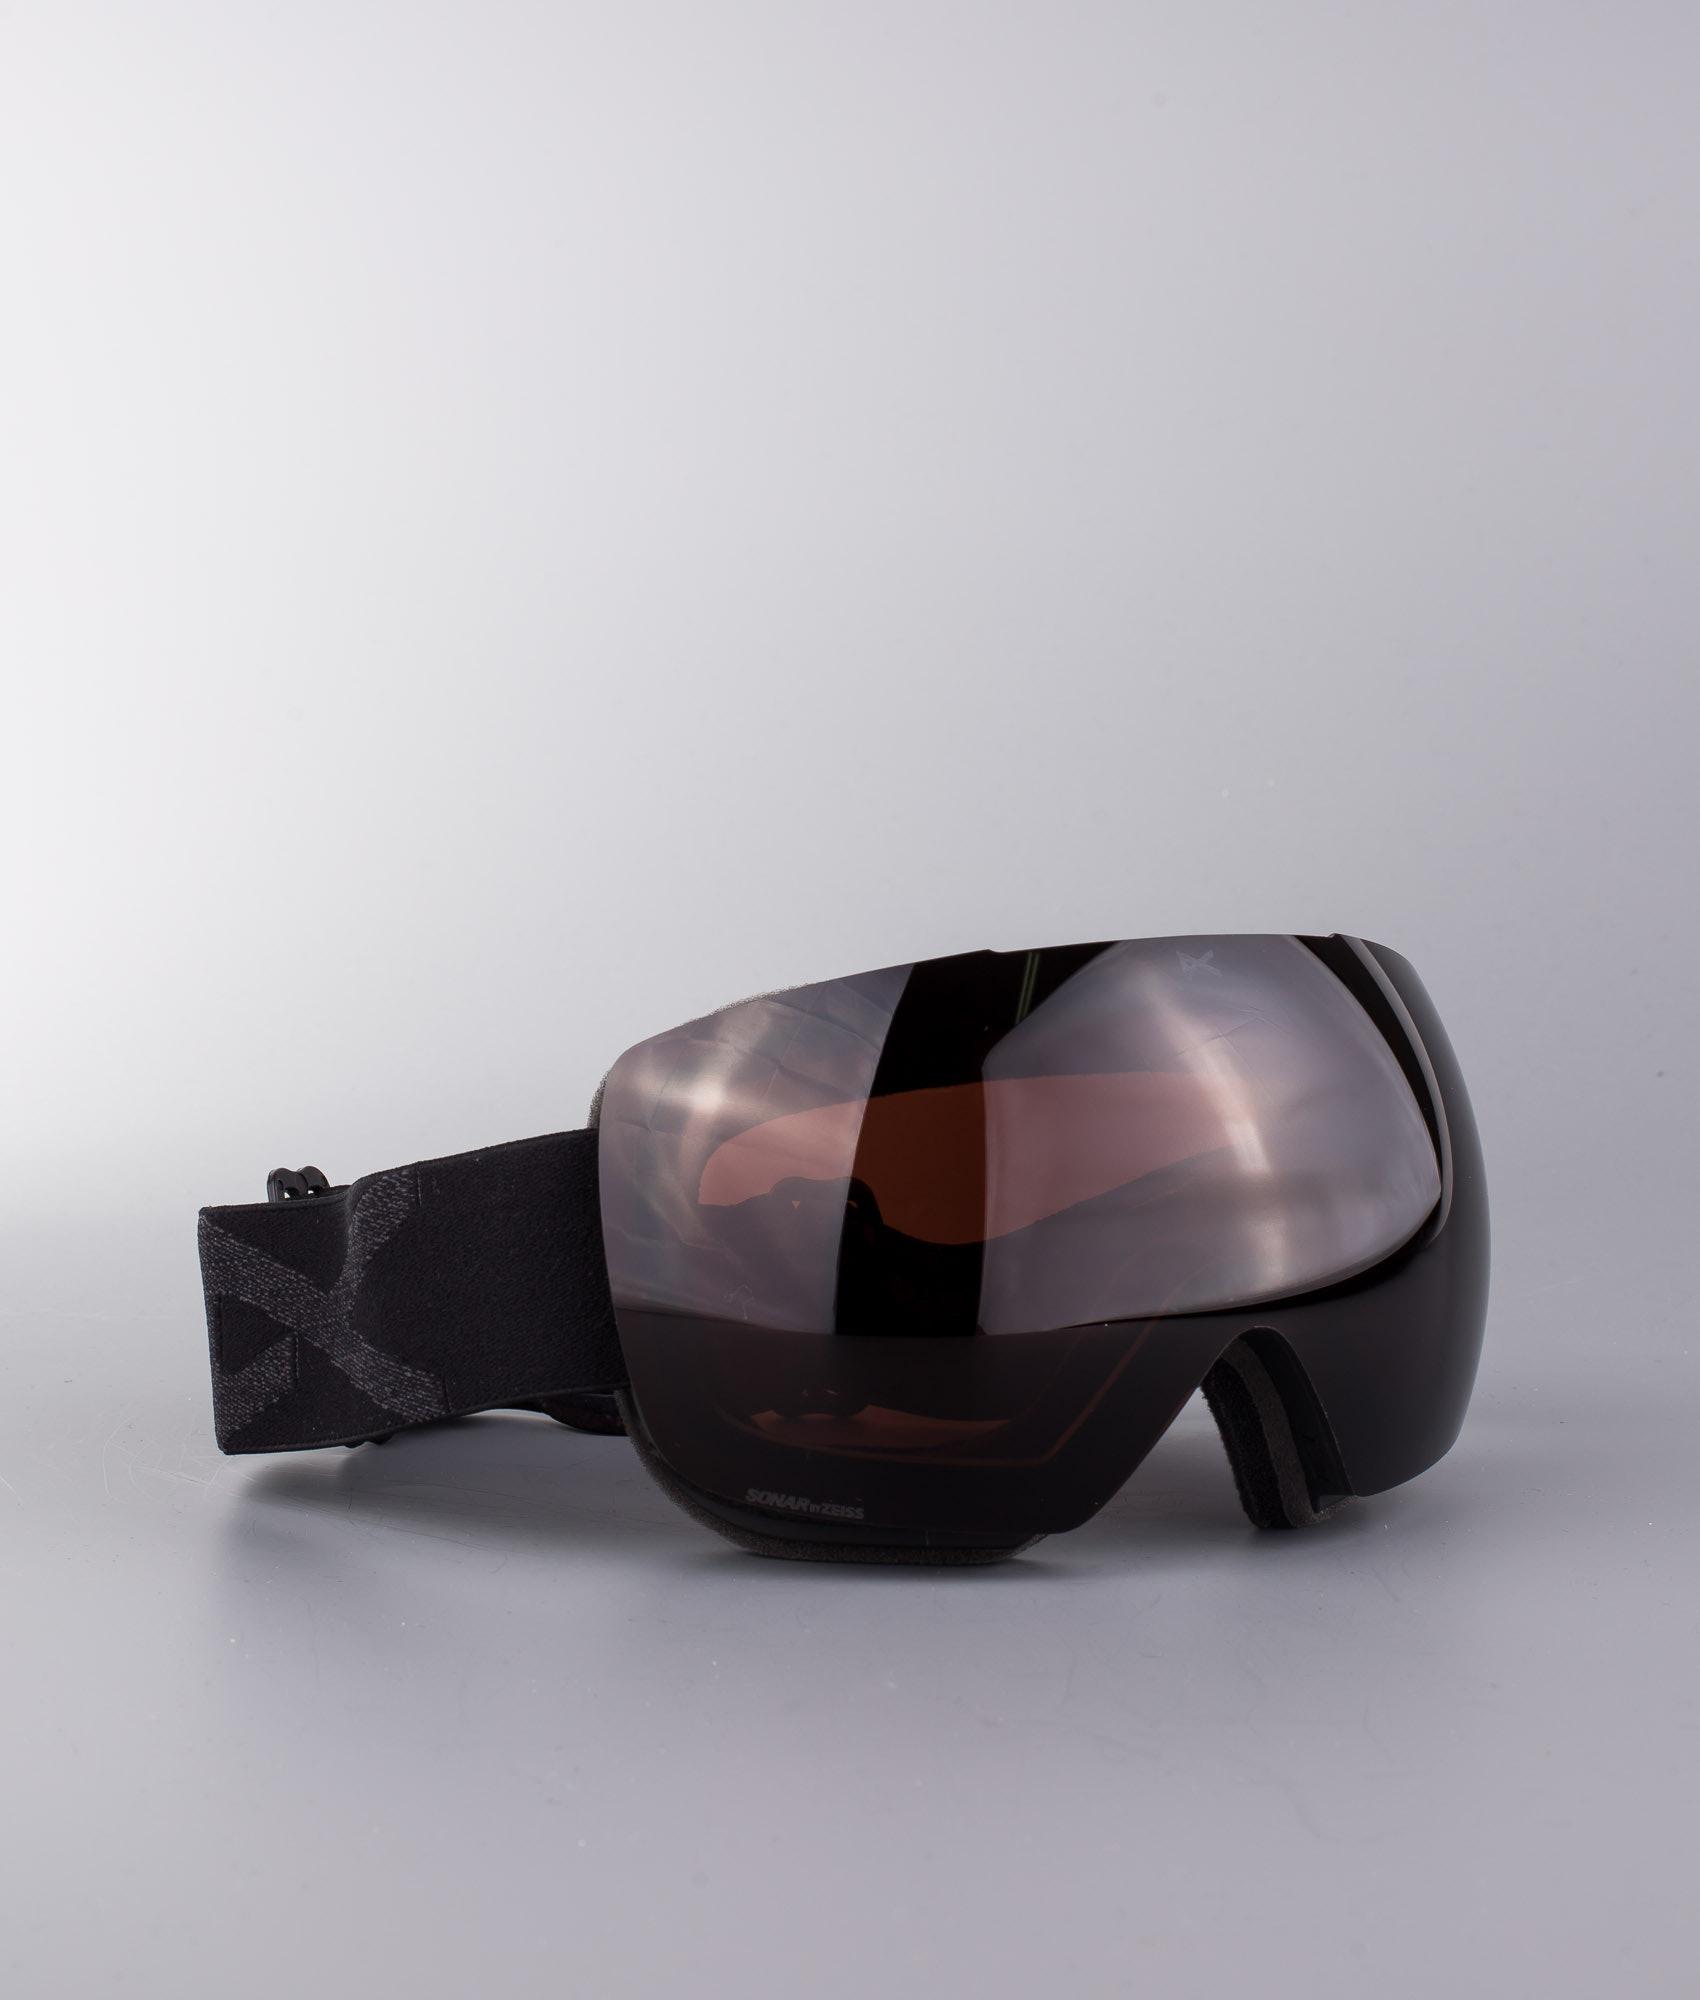 Anon Mig Mfi Skidglasögon Smoke Sonarsmoke - Ridestore.se c52987d1af450